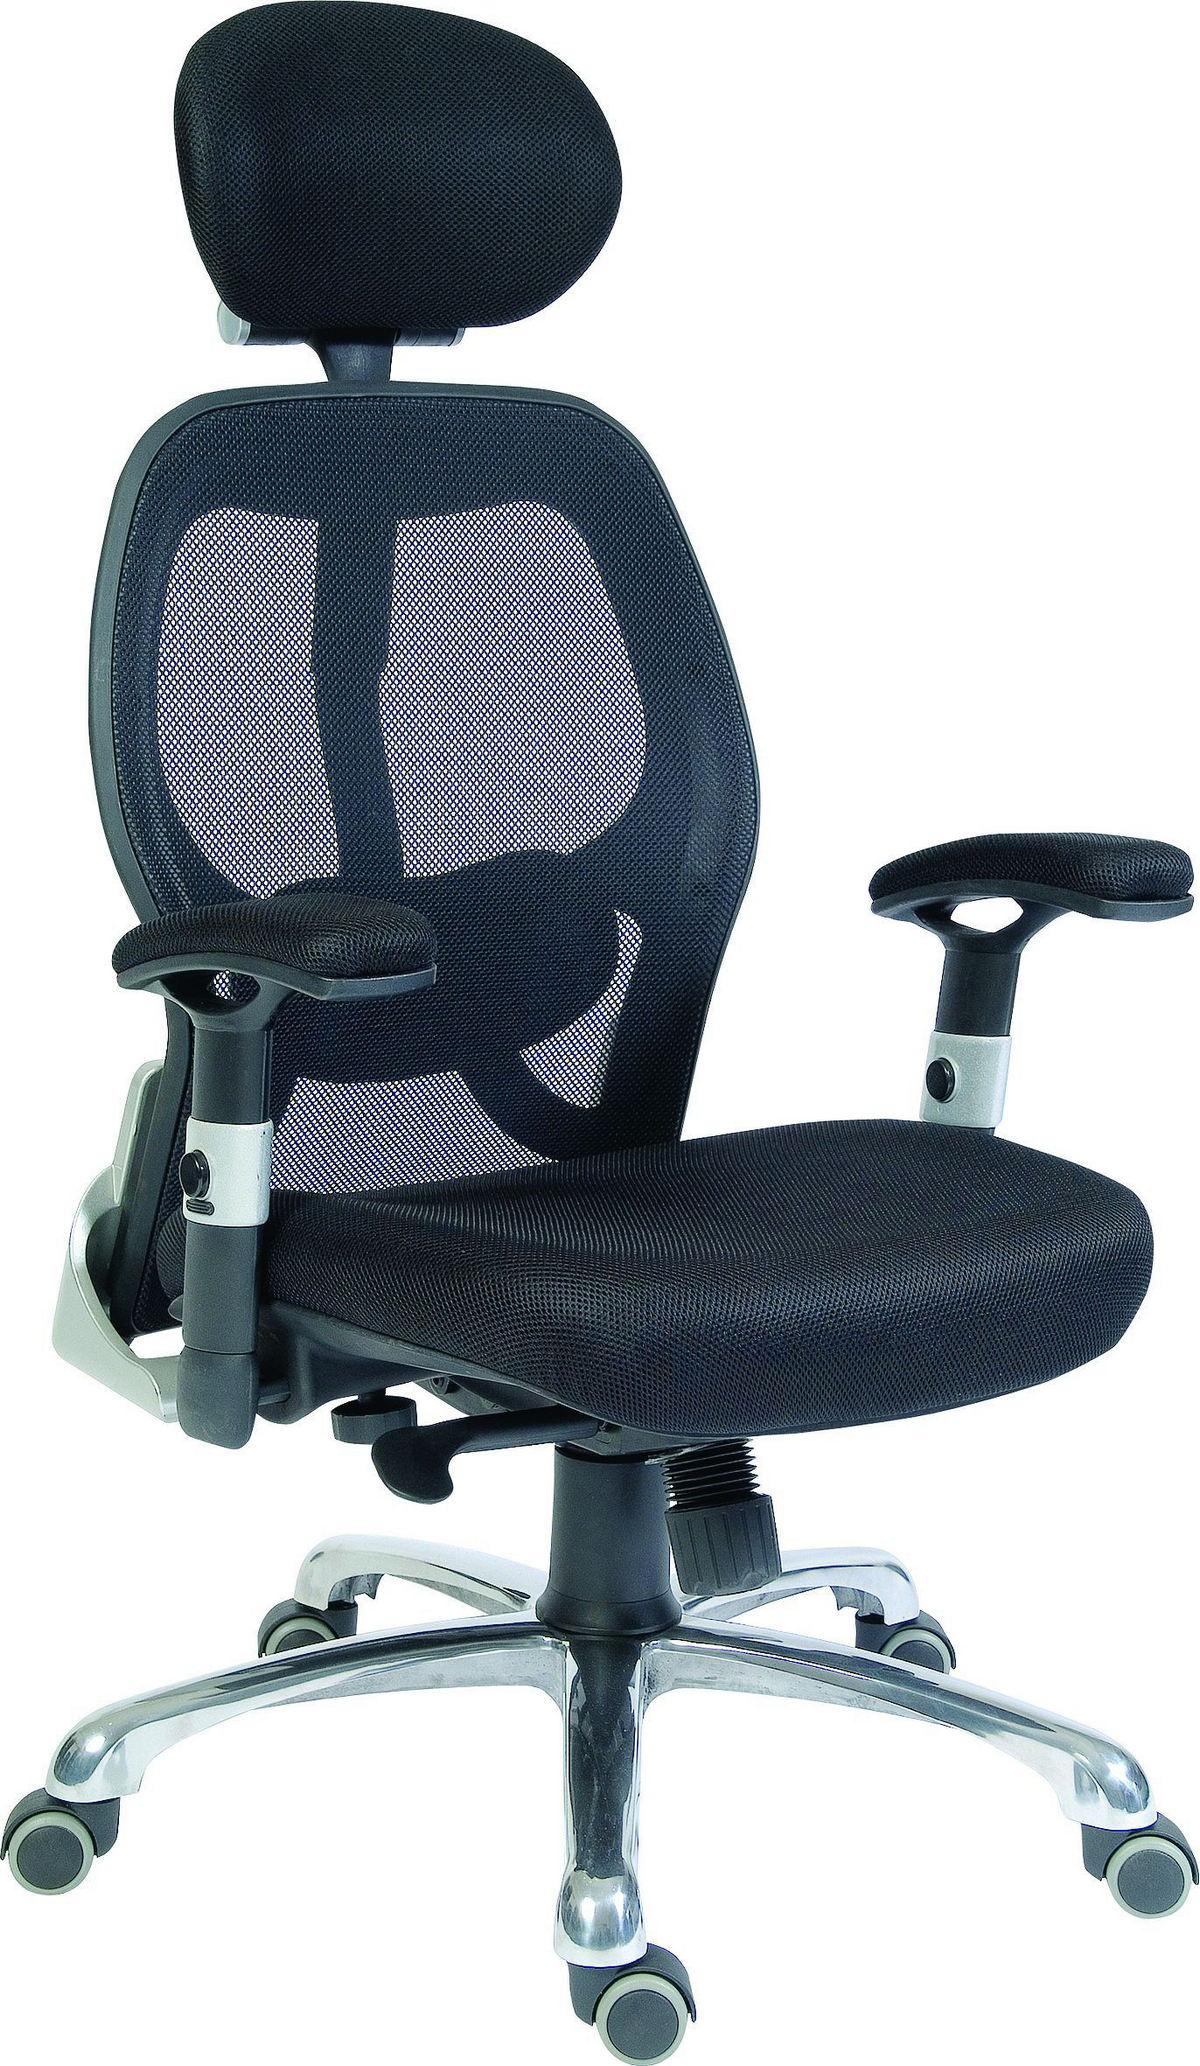 Cobham Luxury Mesh Back Chair